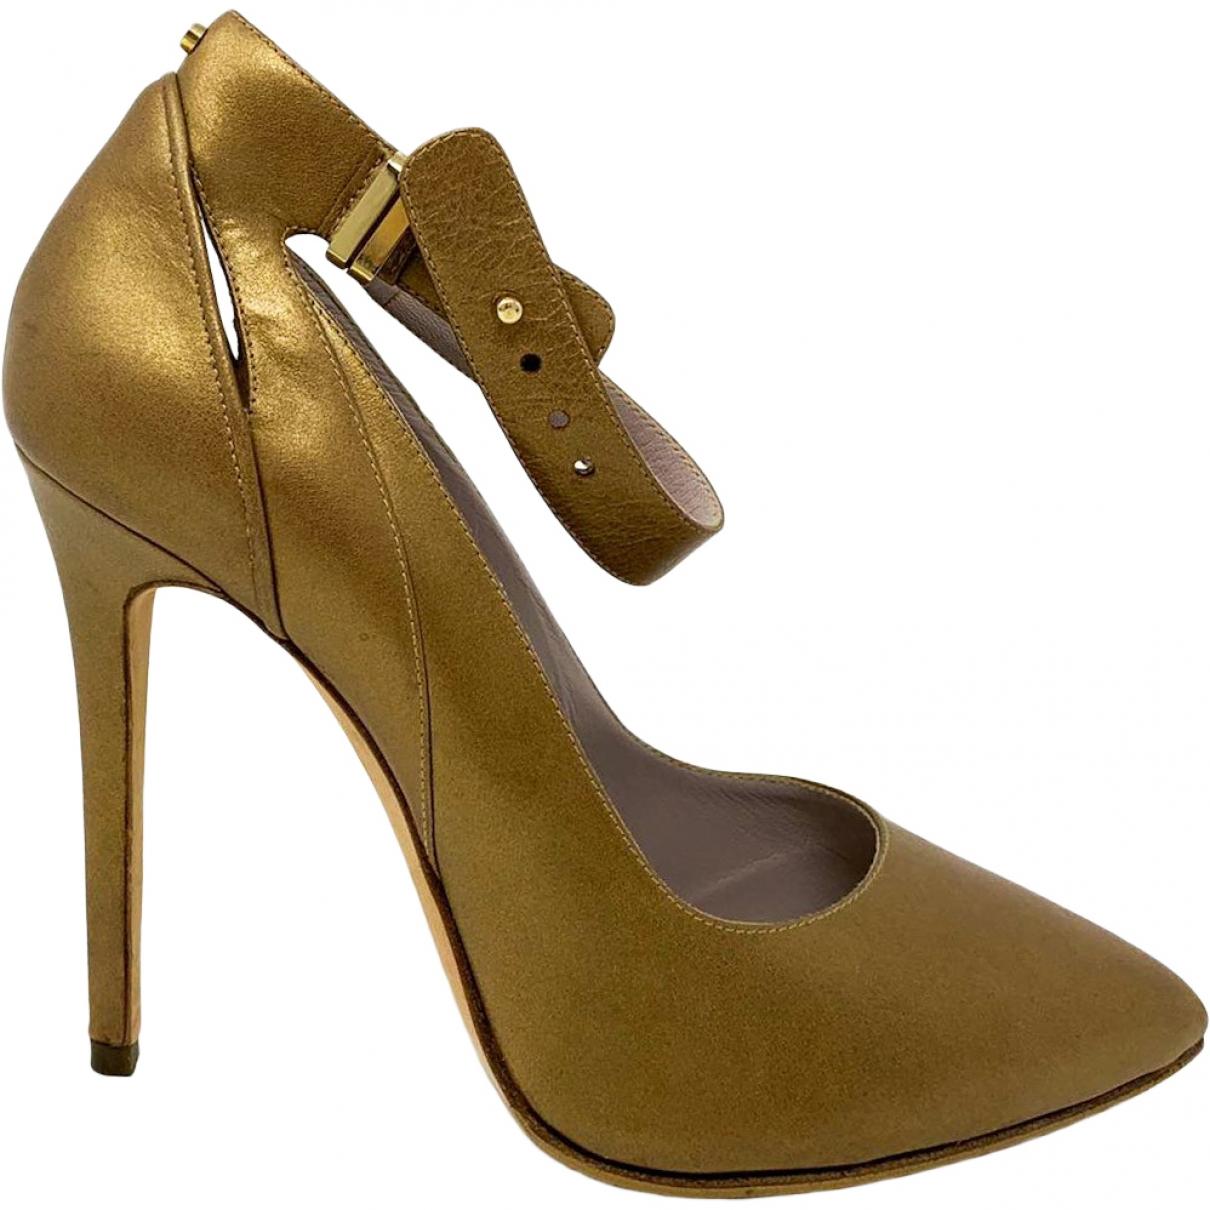 Elie Saab \N Gold Leather Heels for Women 39.5 EU